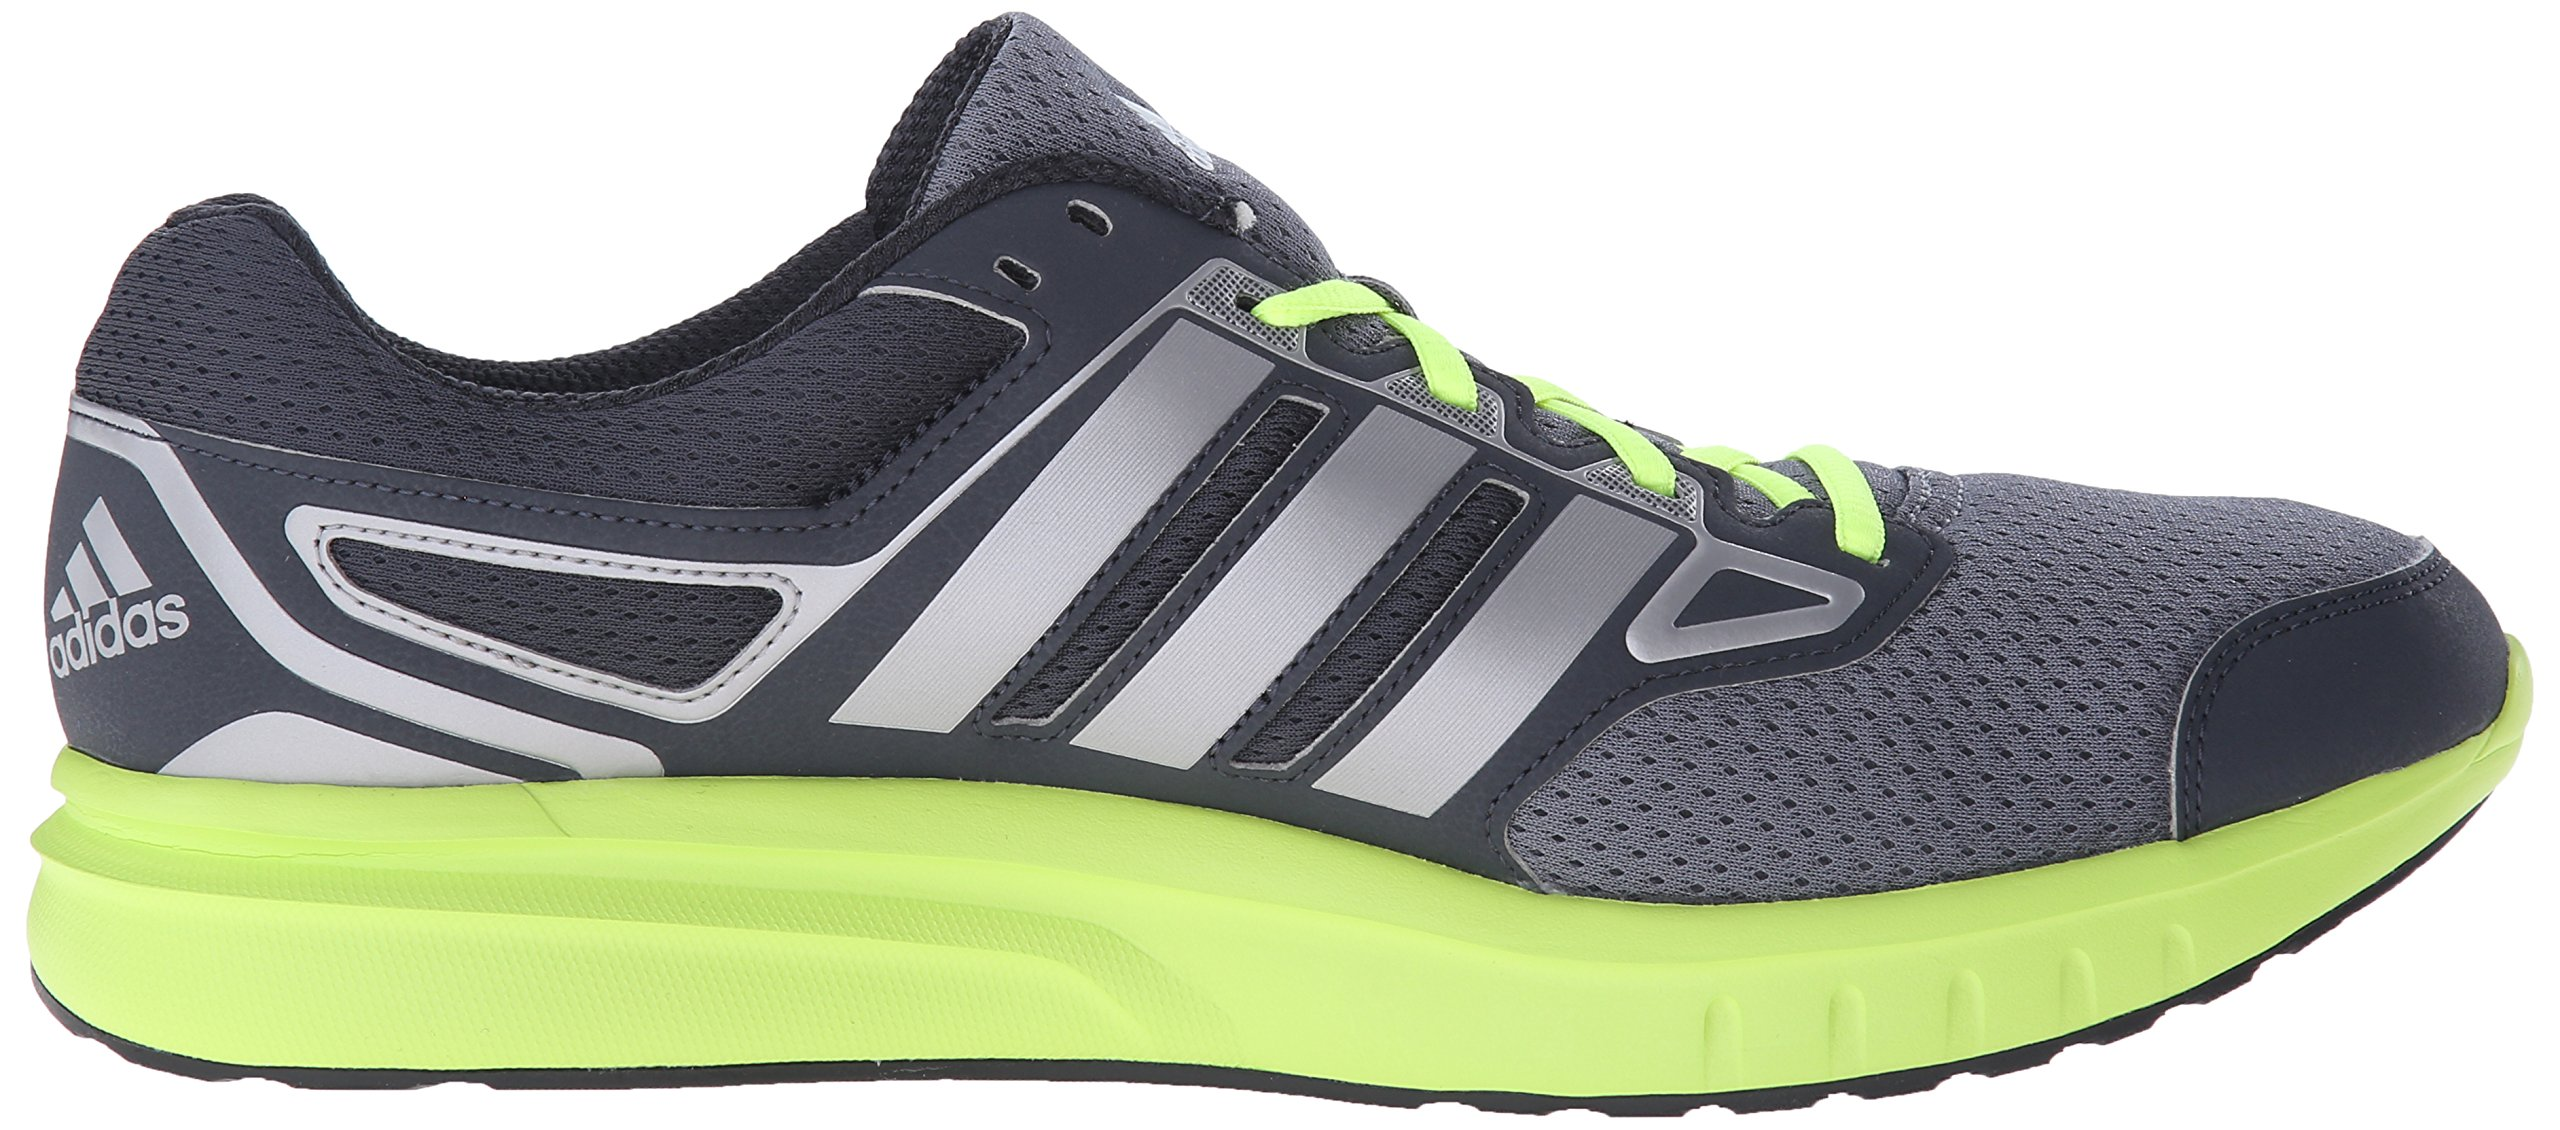 Adidas Galactic Running Shoe